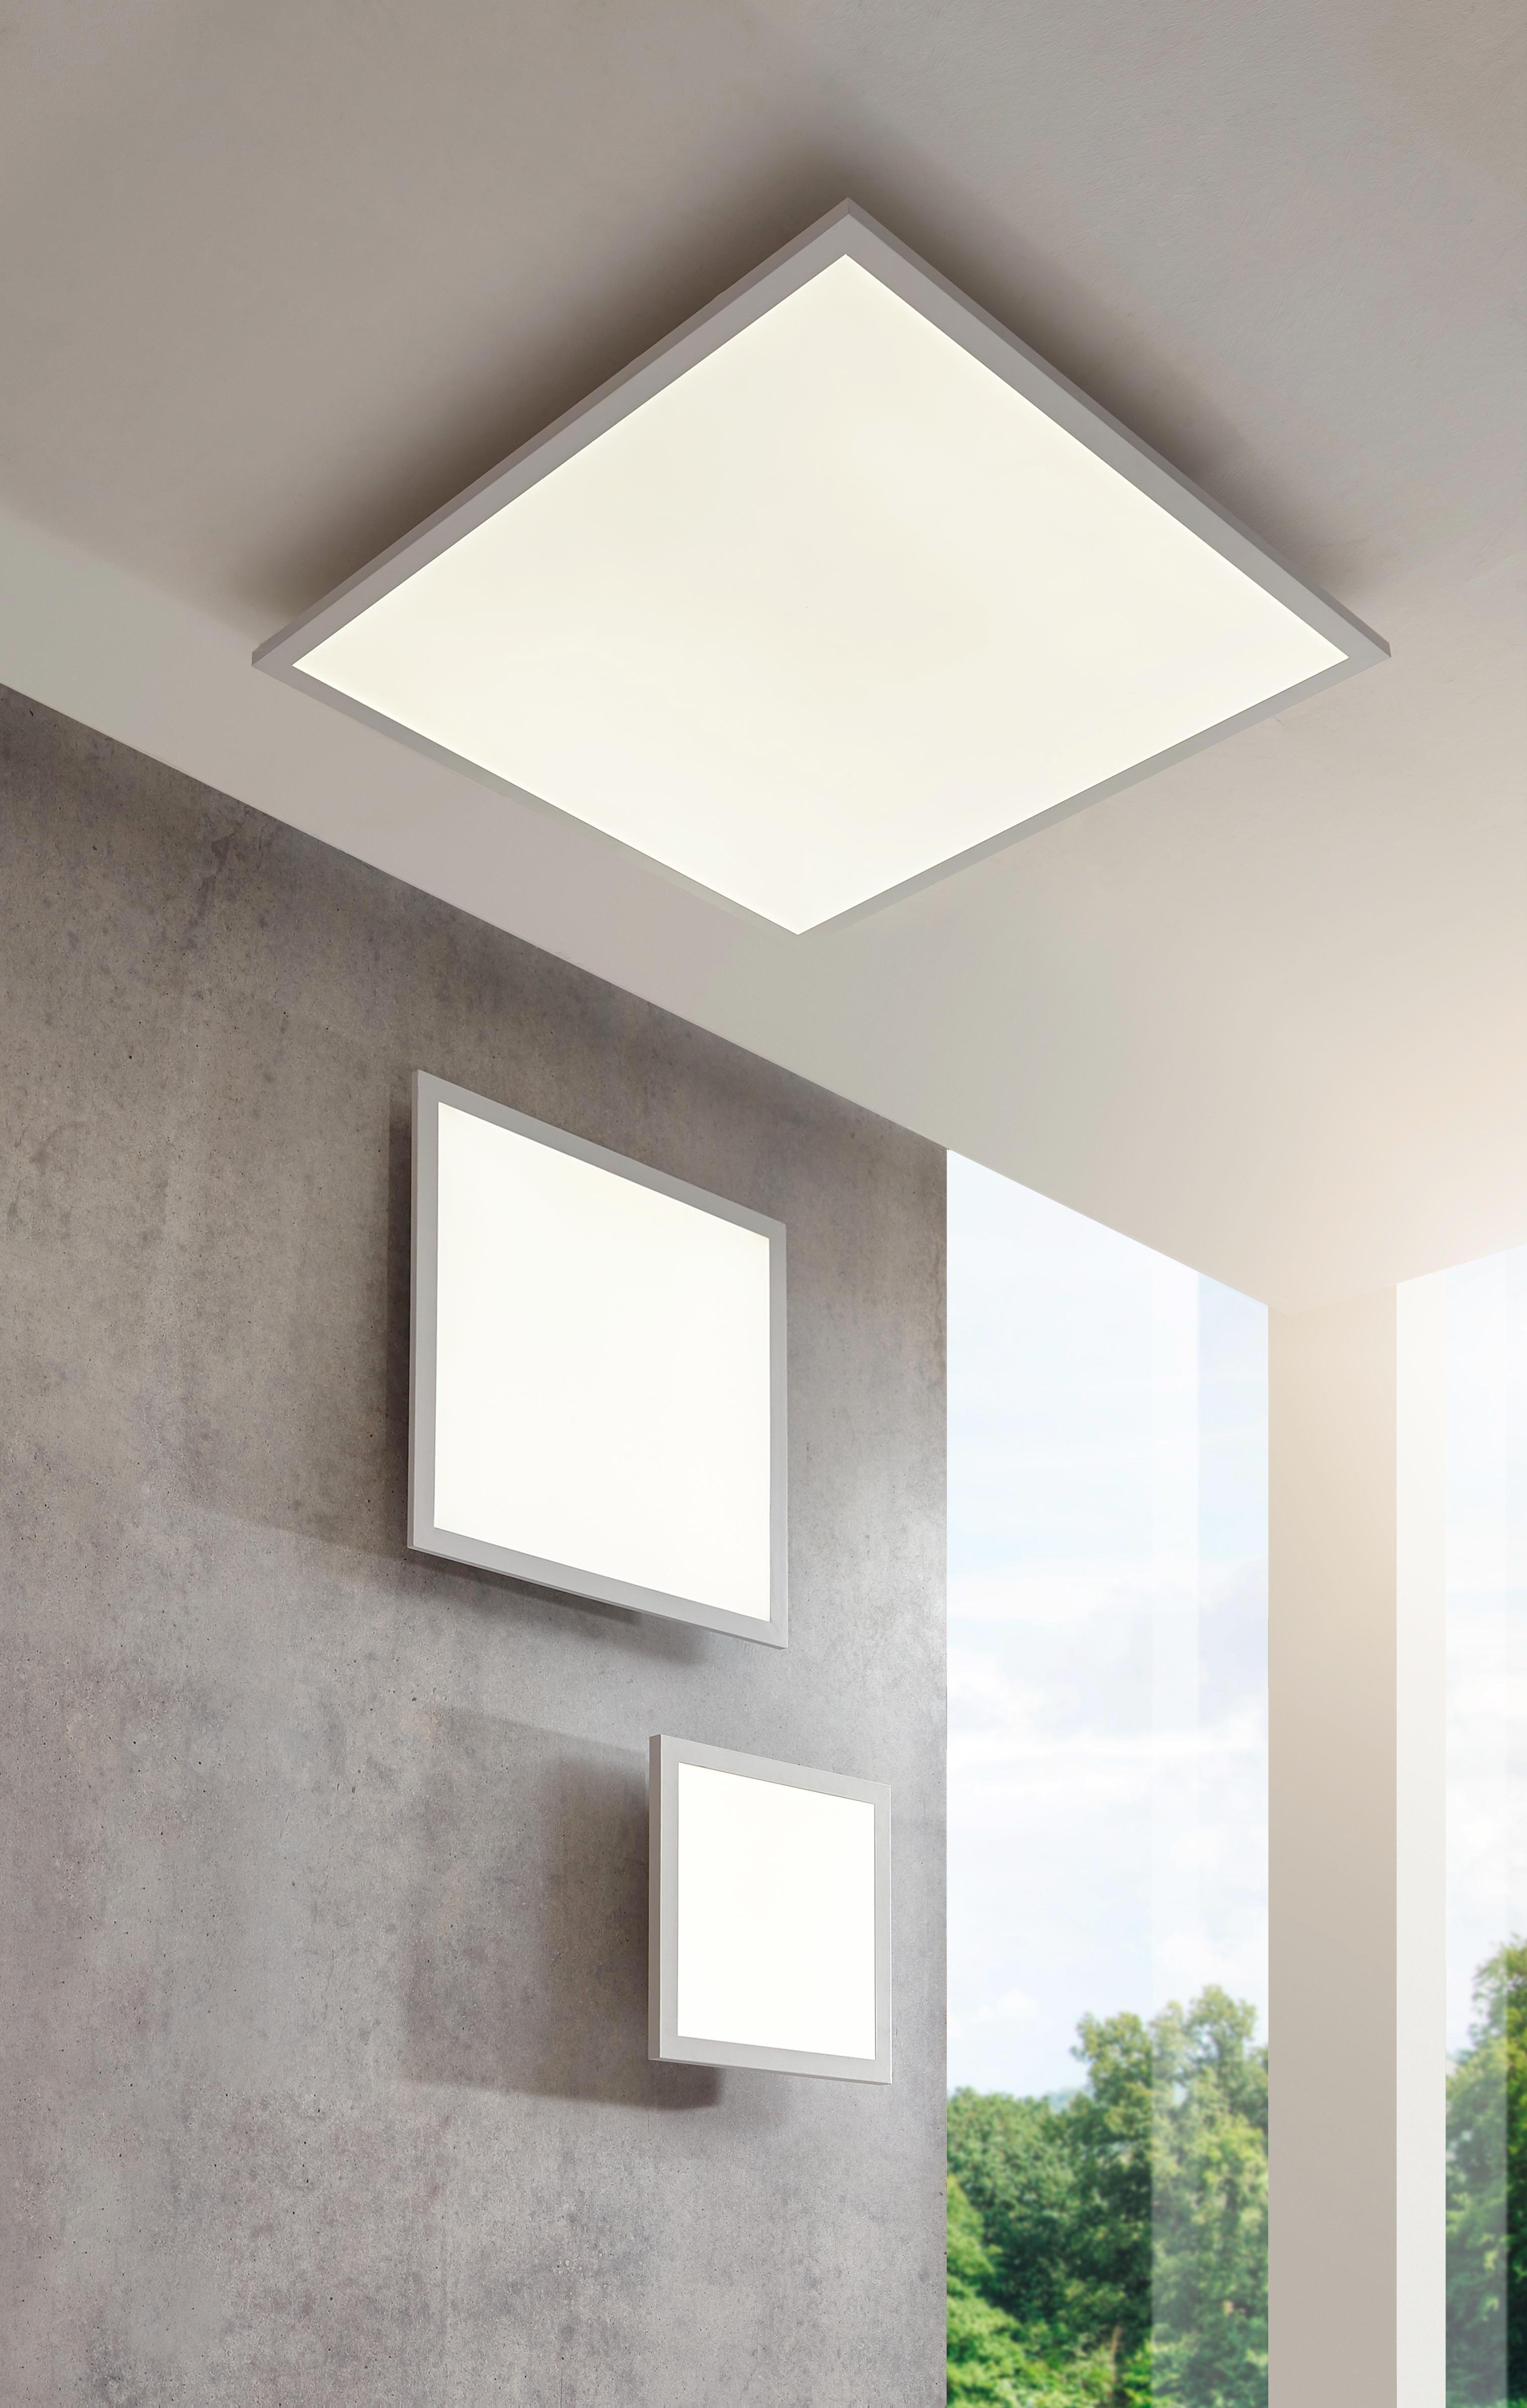 LED-DECKENLEUCHTE - Weiß, Design, Metall (30/30/5,6cm) - NOVEL